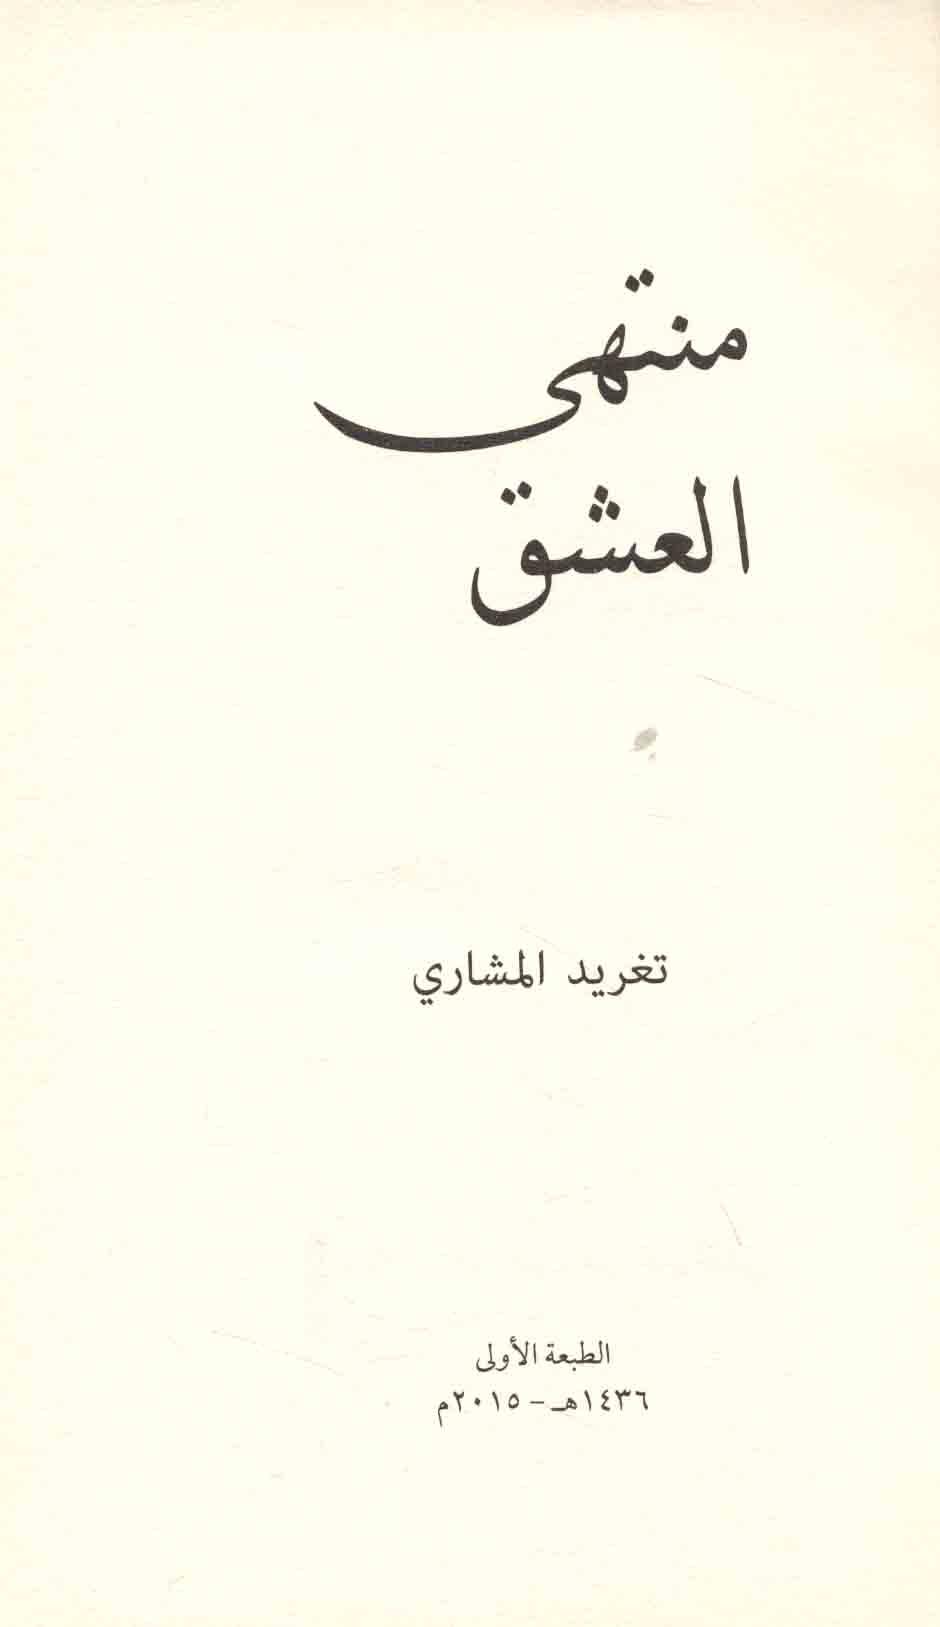 Muntaha al-ishq